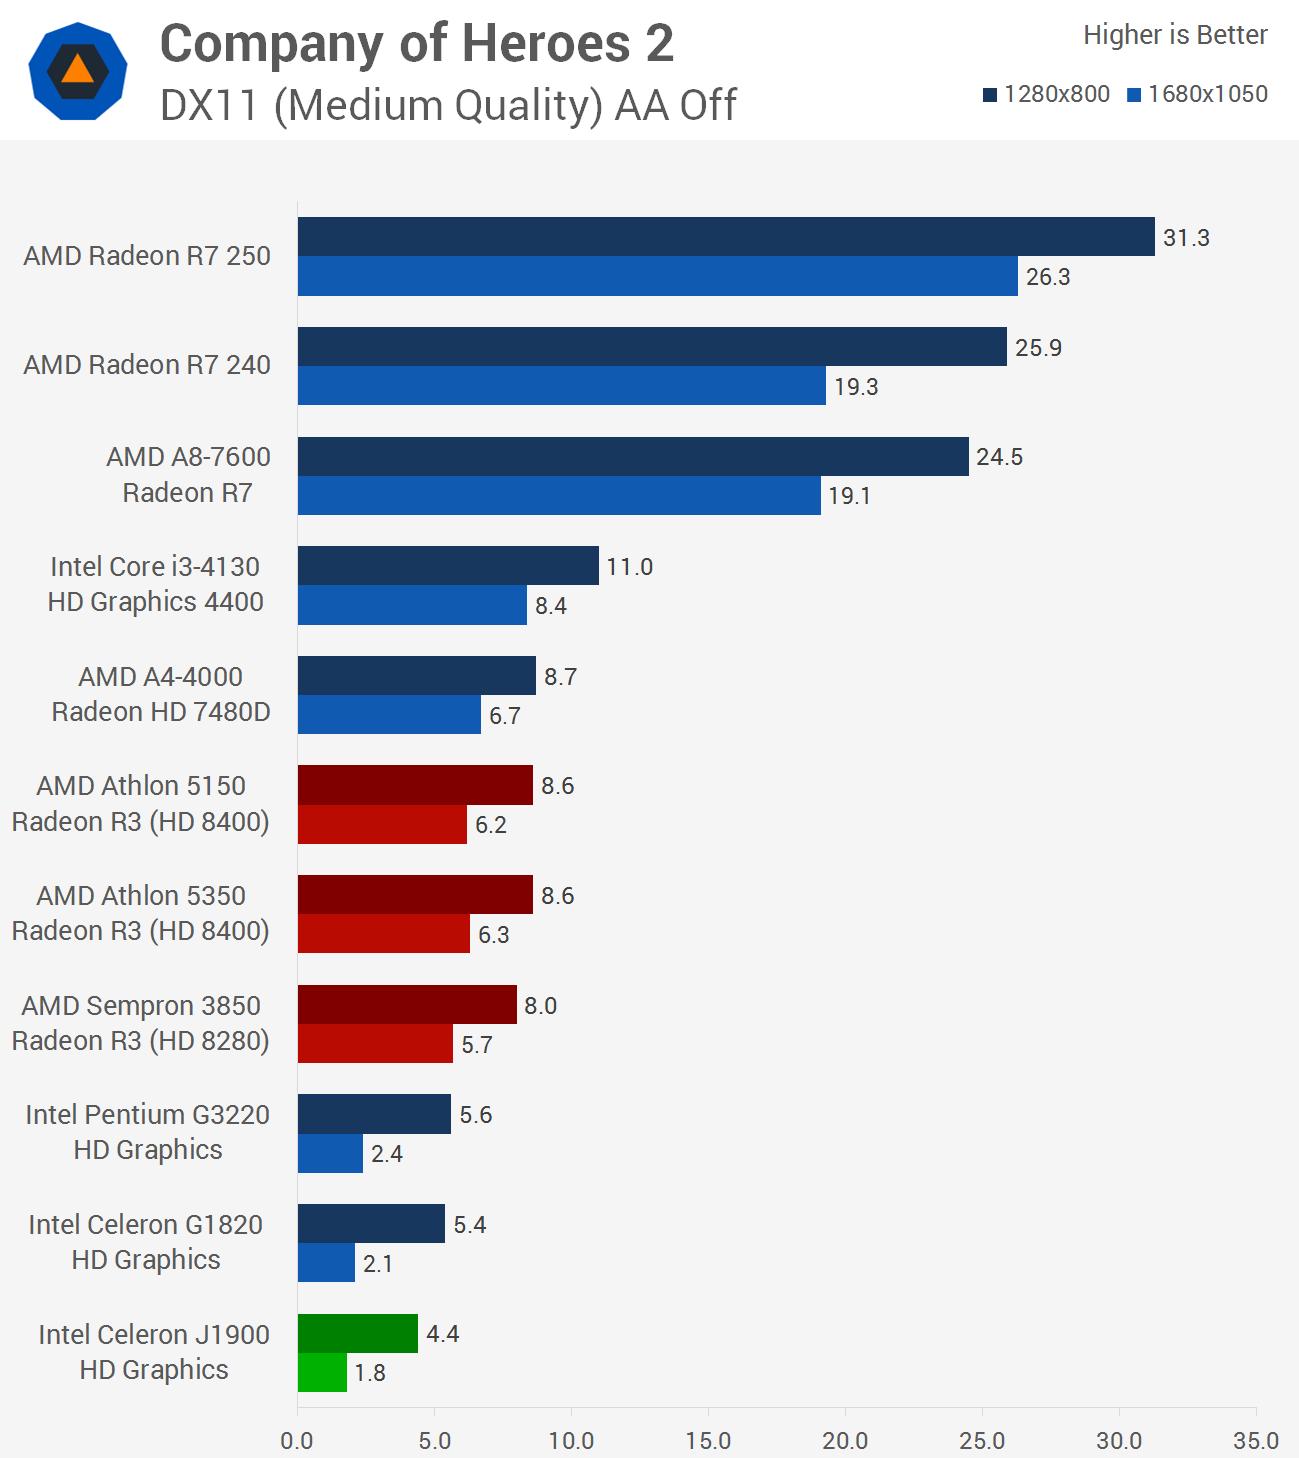 Budget Cpu Roundup Amd Kabini Vs Intel Bay Trail D Igp Gaming Peformance